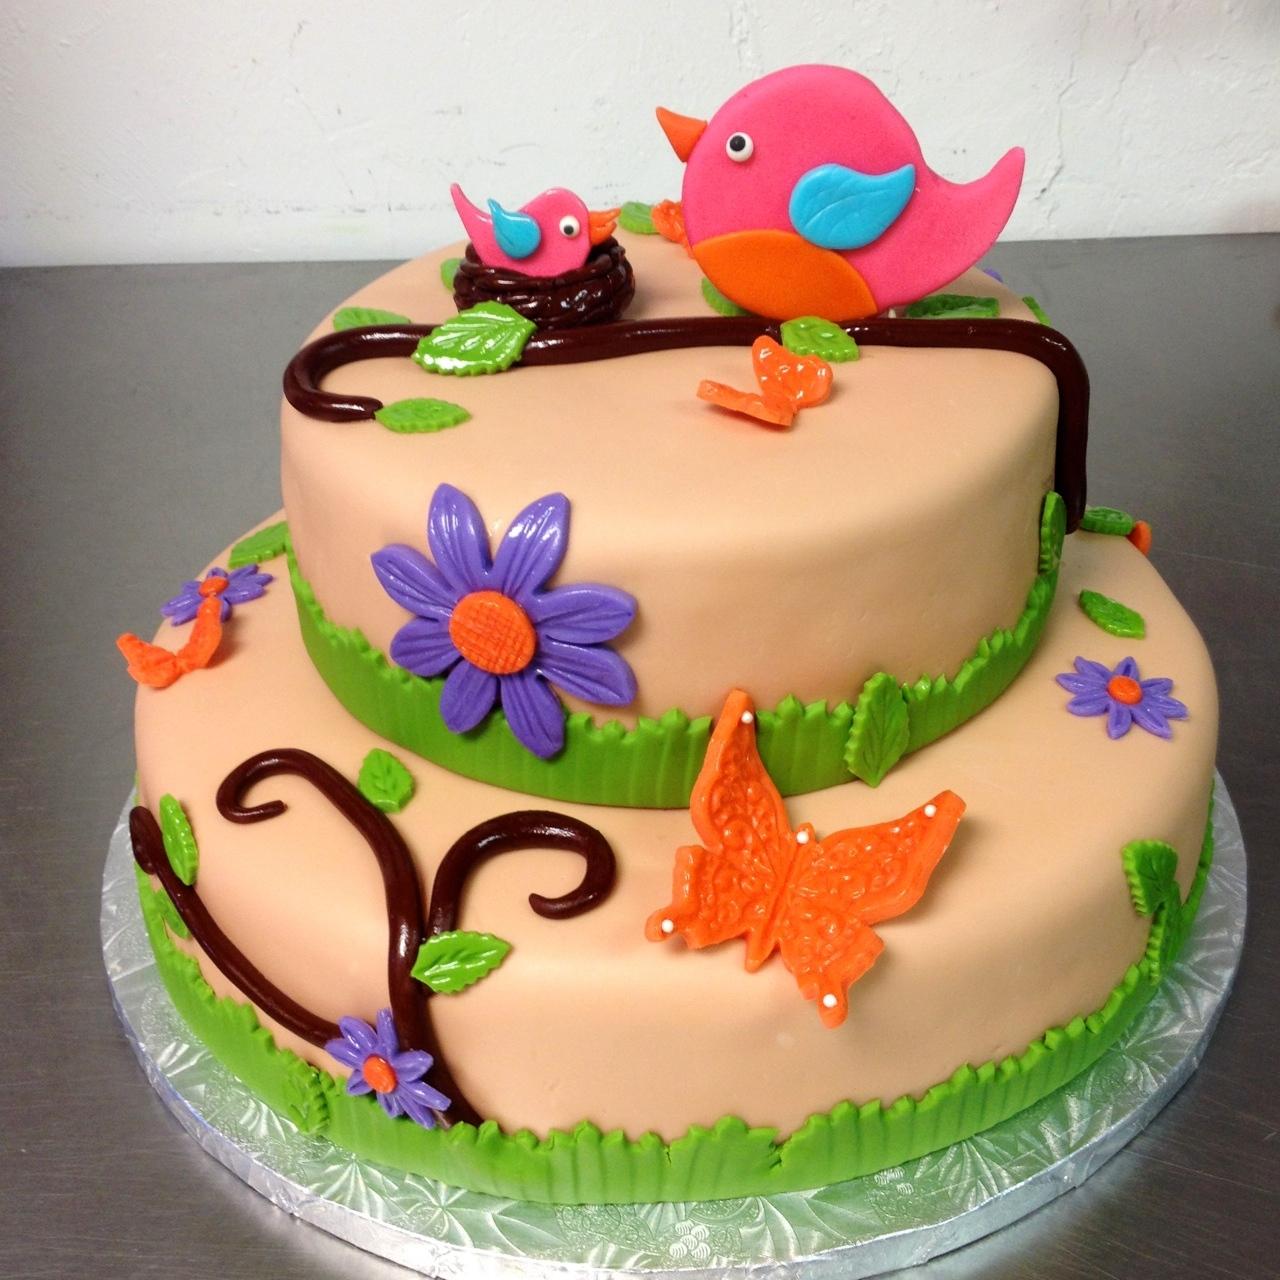 Cakes By Neide 16936 S Dixie Hwy Palmetto Bay Fl 33157 Yp